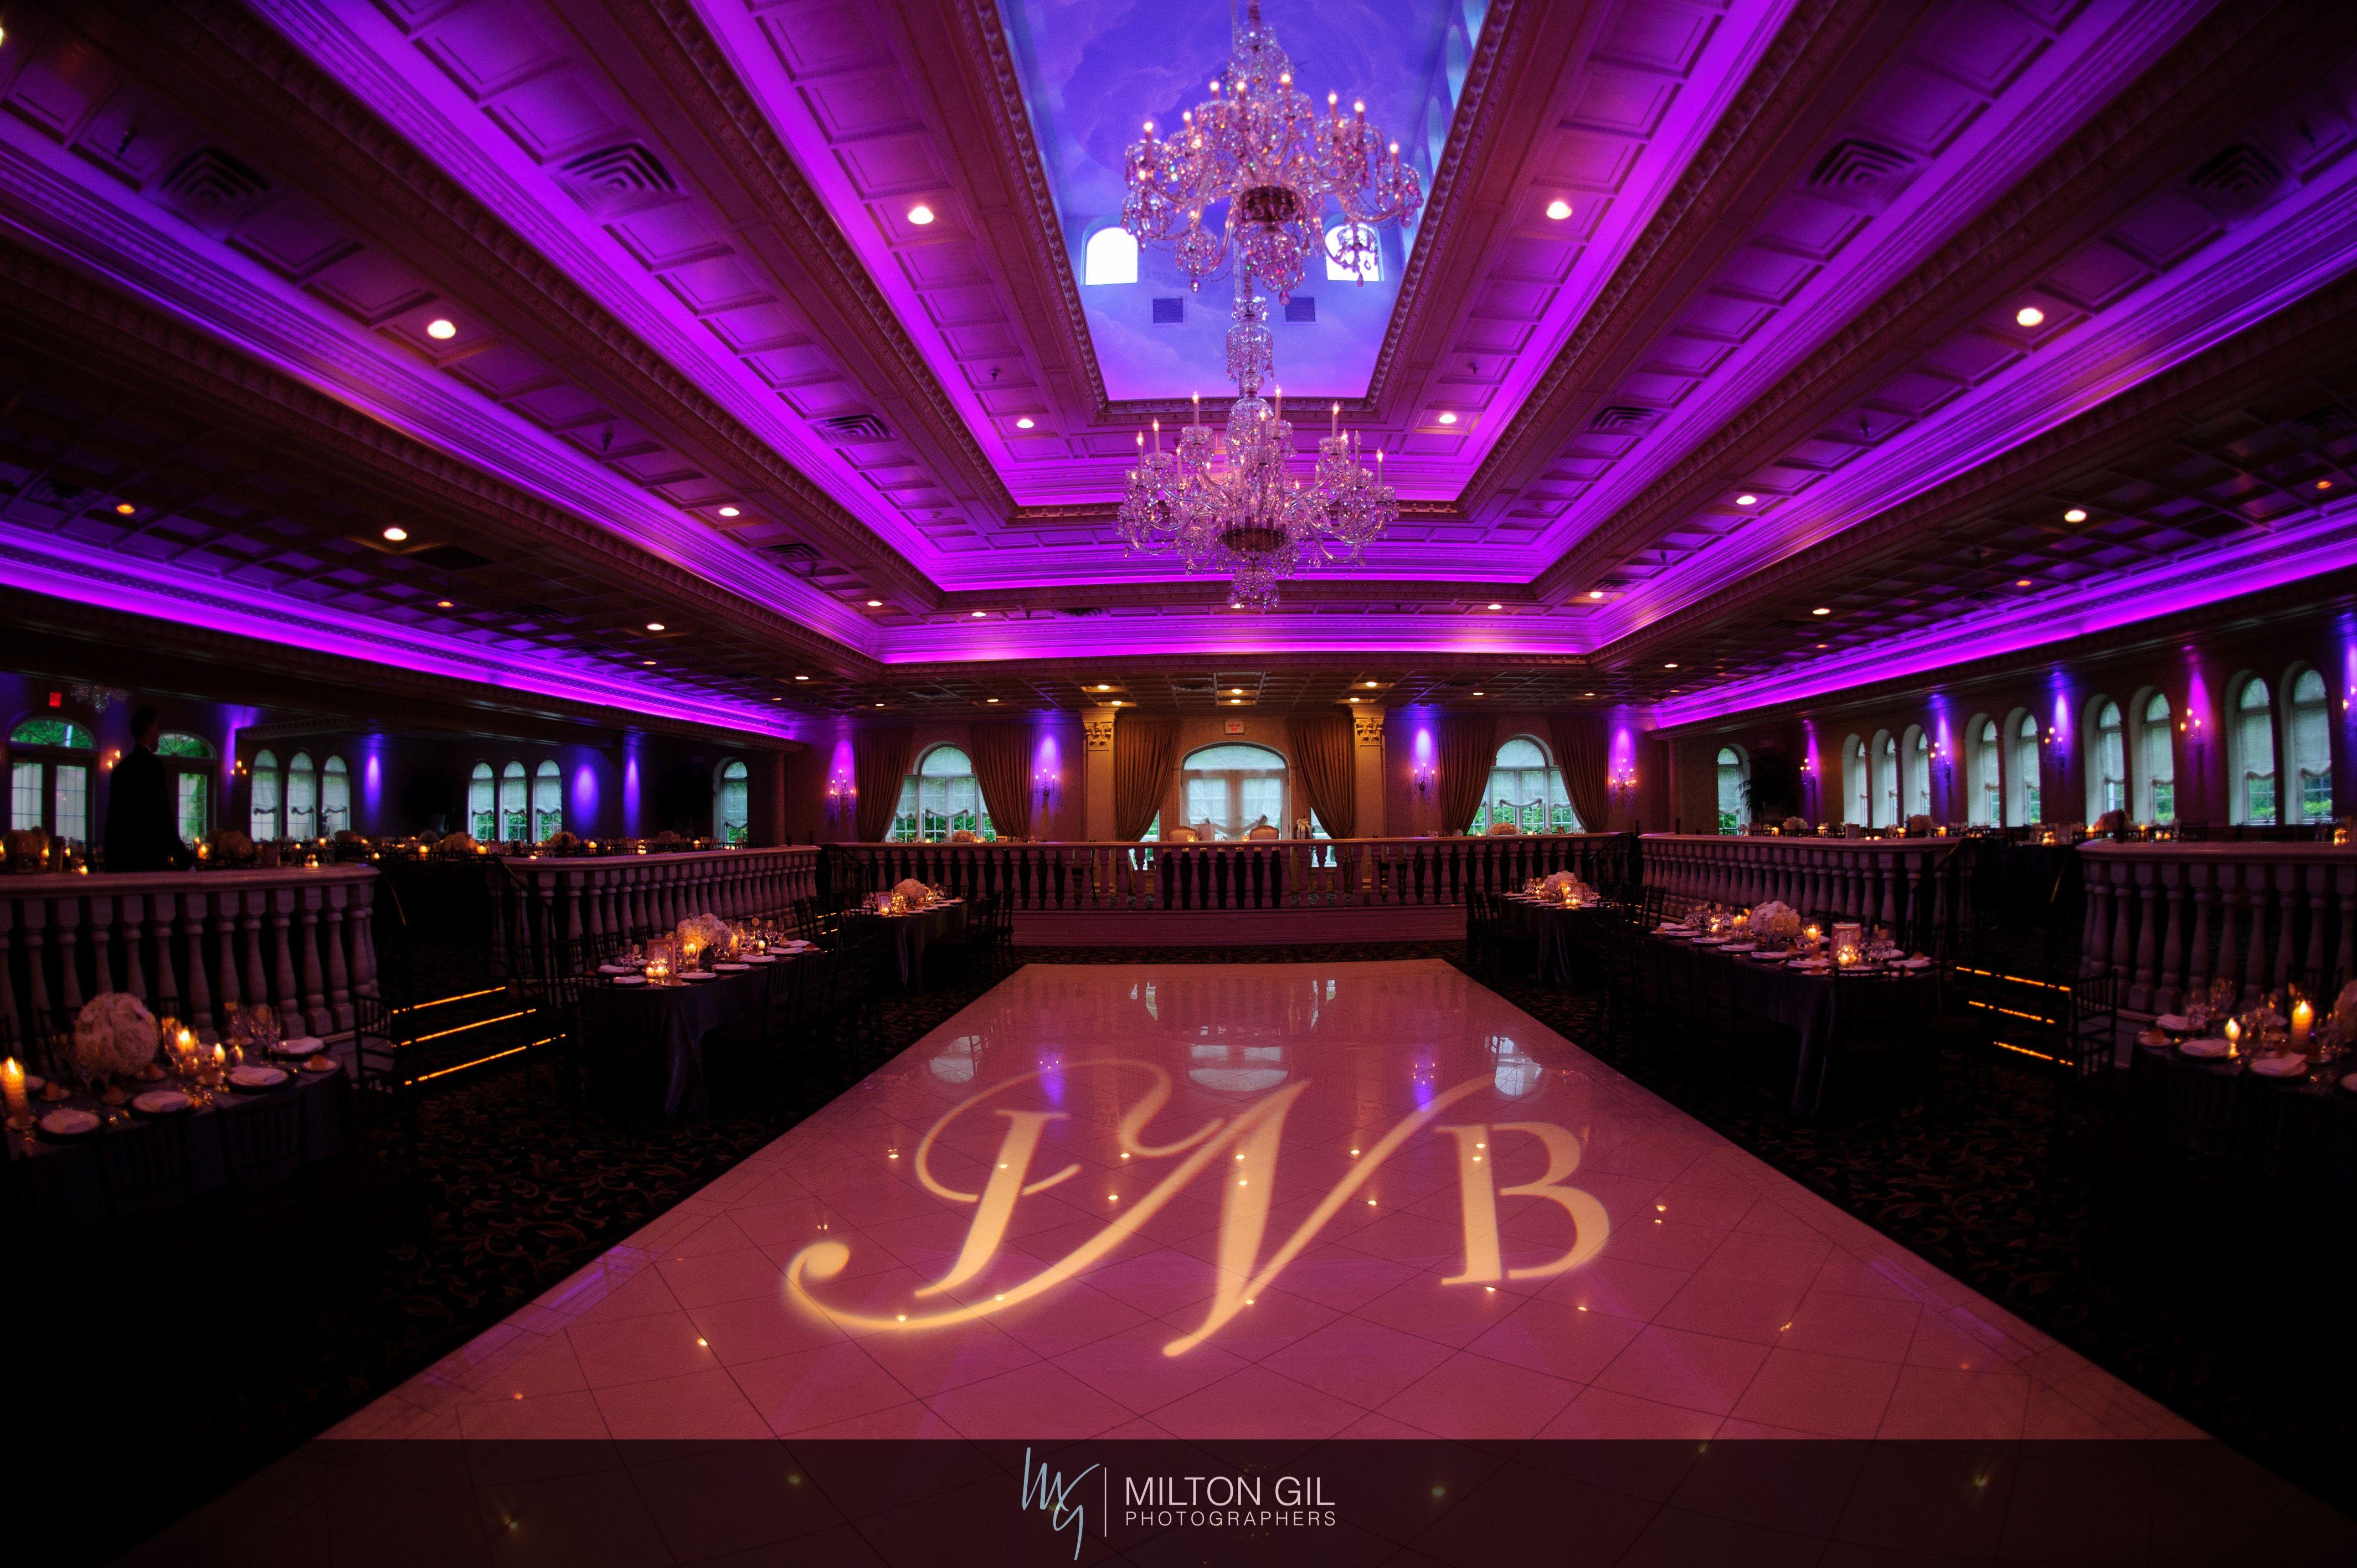 Wedding venue decoration images  wedding venue inspiration  Naninaus Interiors  Pinterest